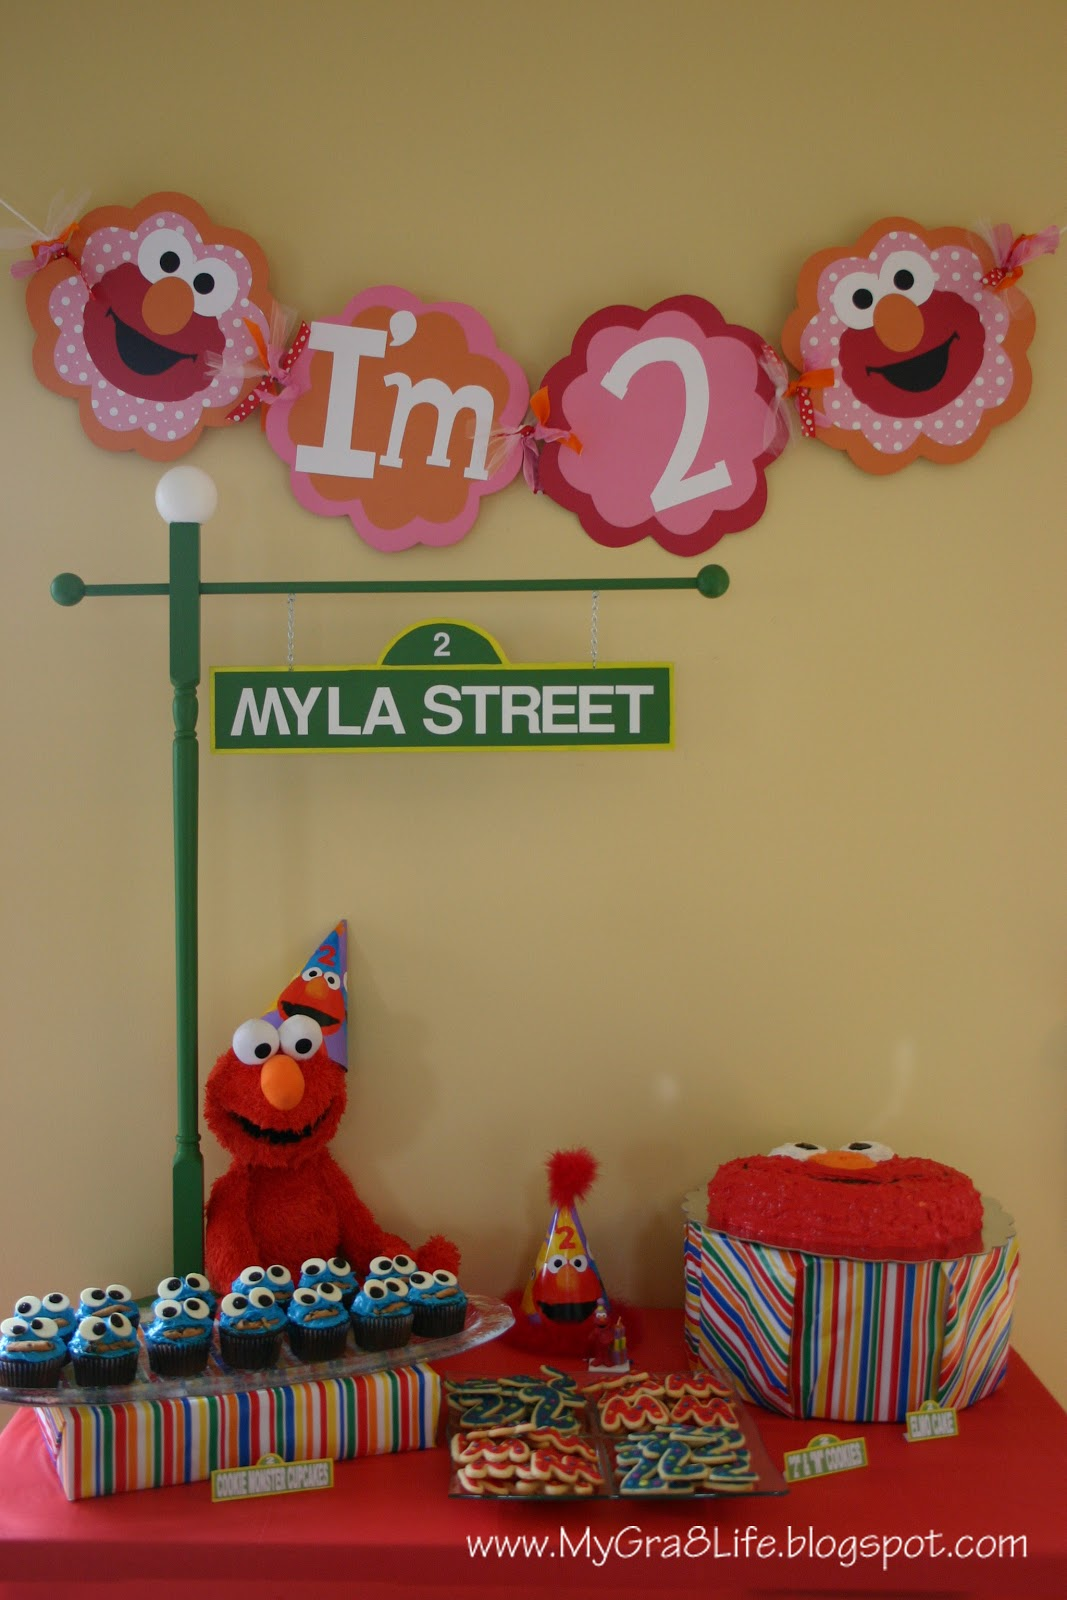 My Gra 8 Life Elmo Party